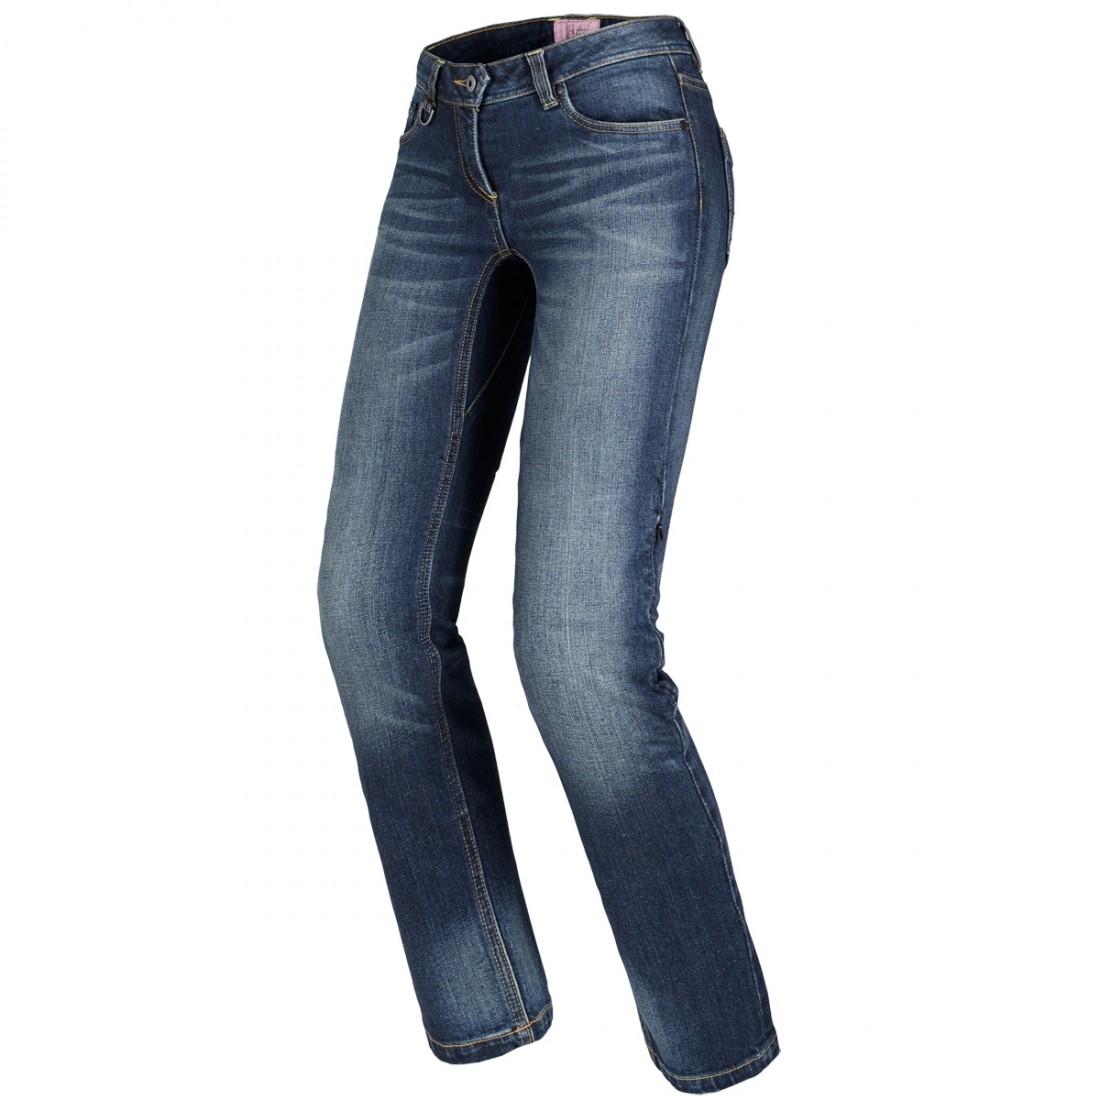 a77b59967a8 Pantalon SPIDI J-Tracker L32 Lady Blue Dark Used · Motocard